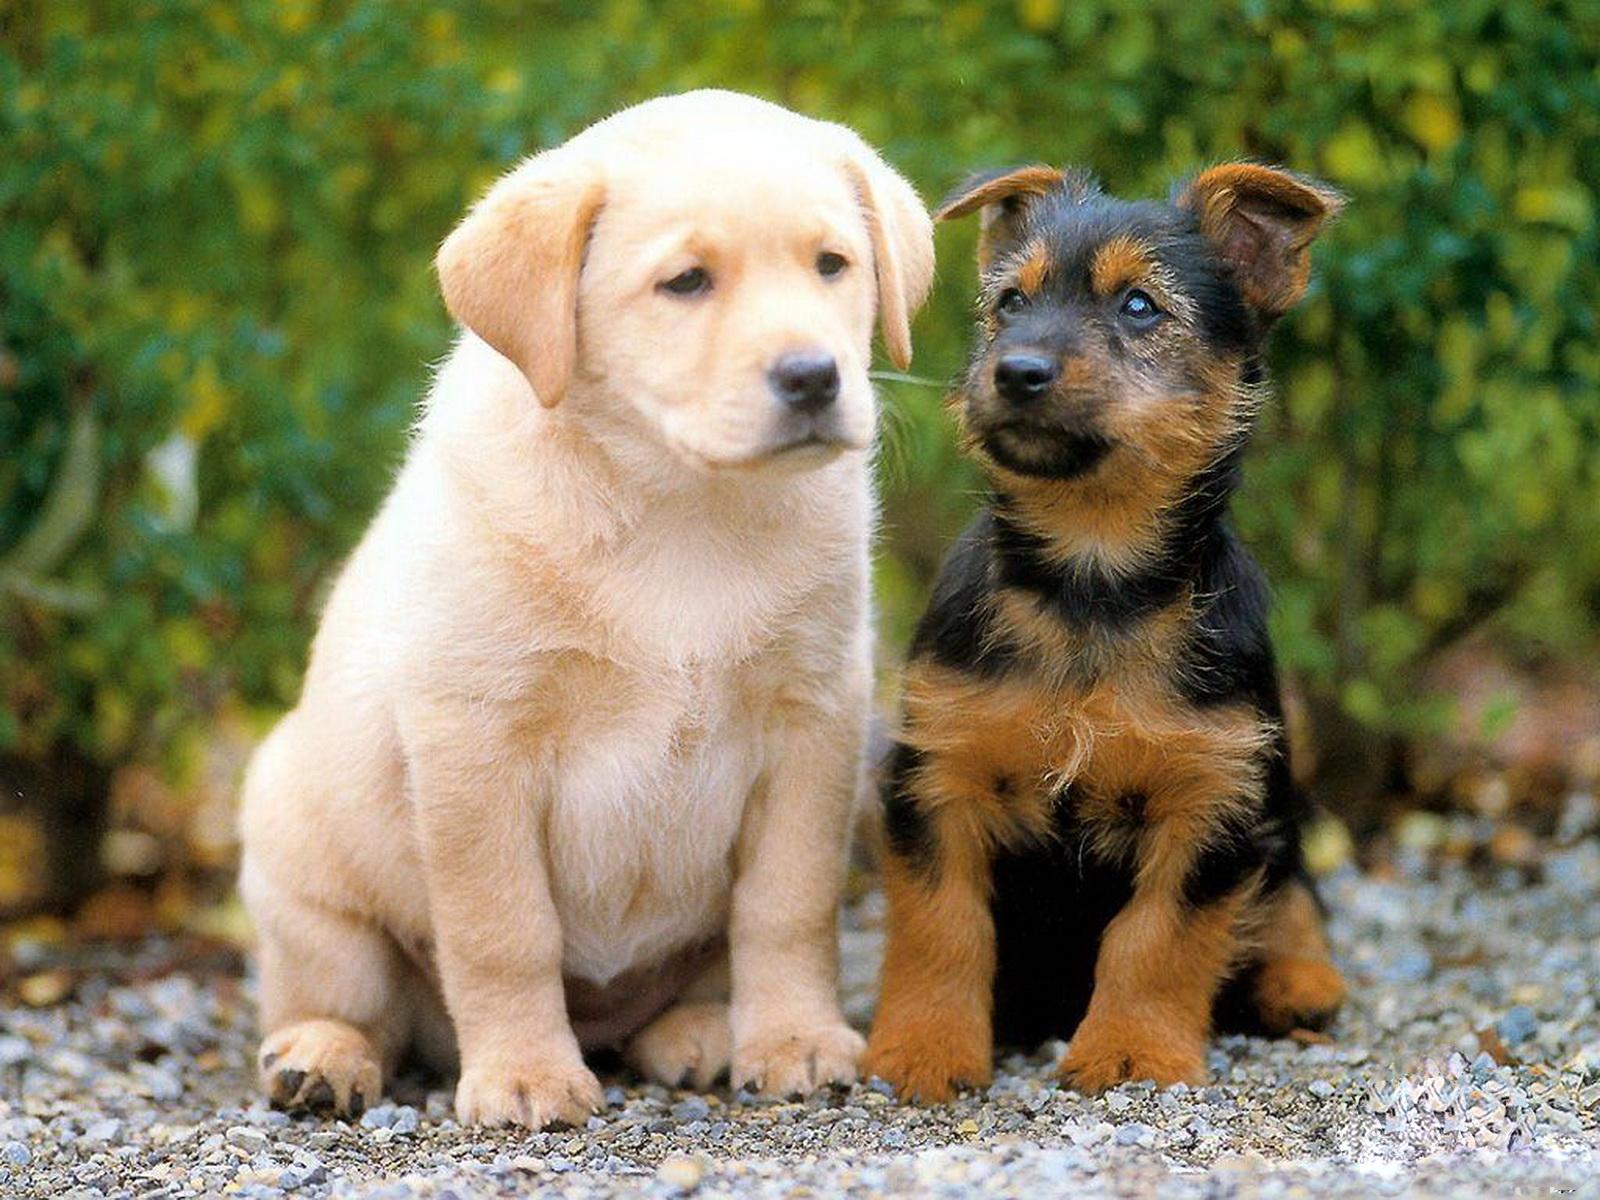 Dogs   Wallpapers Pictures Pics Images Photos Desktop 1600x1200